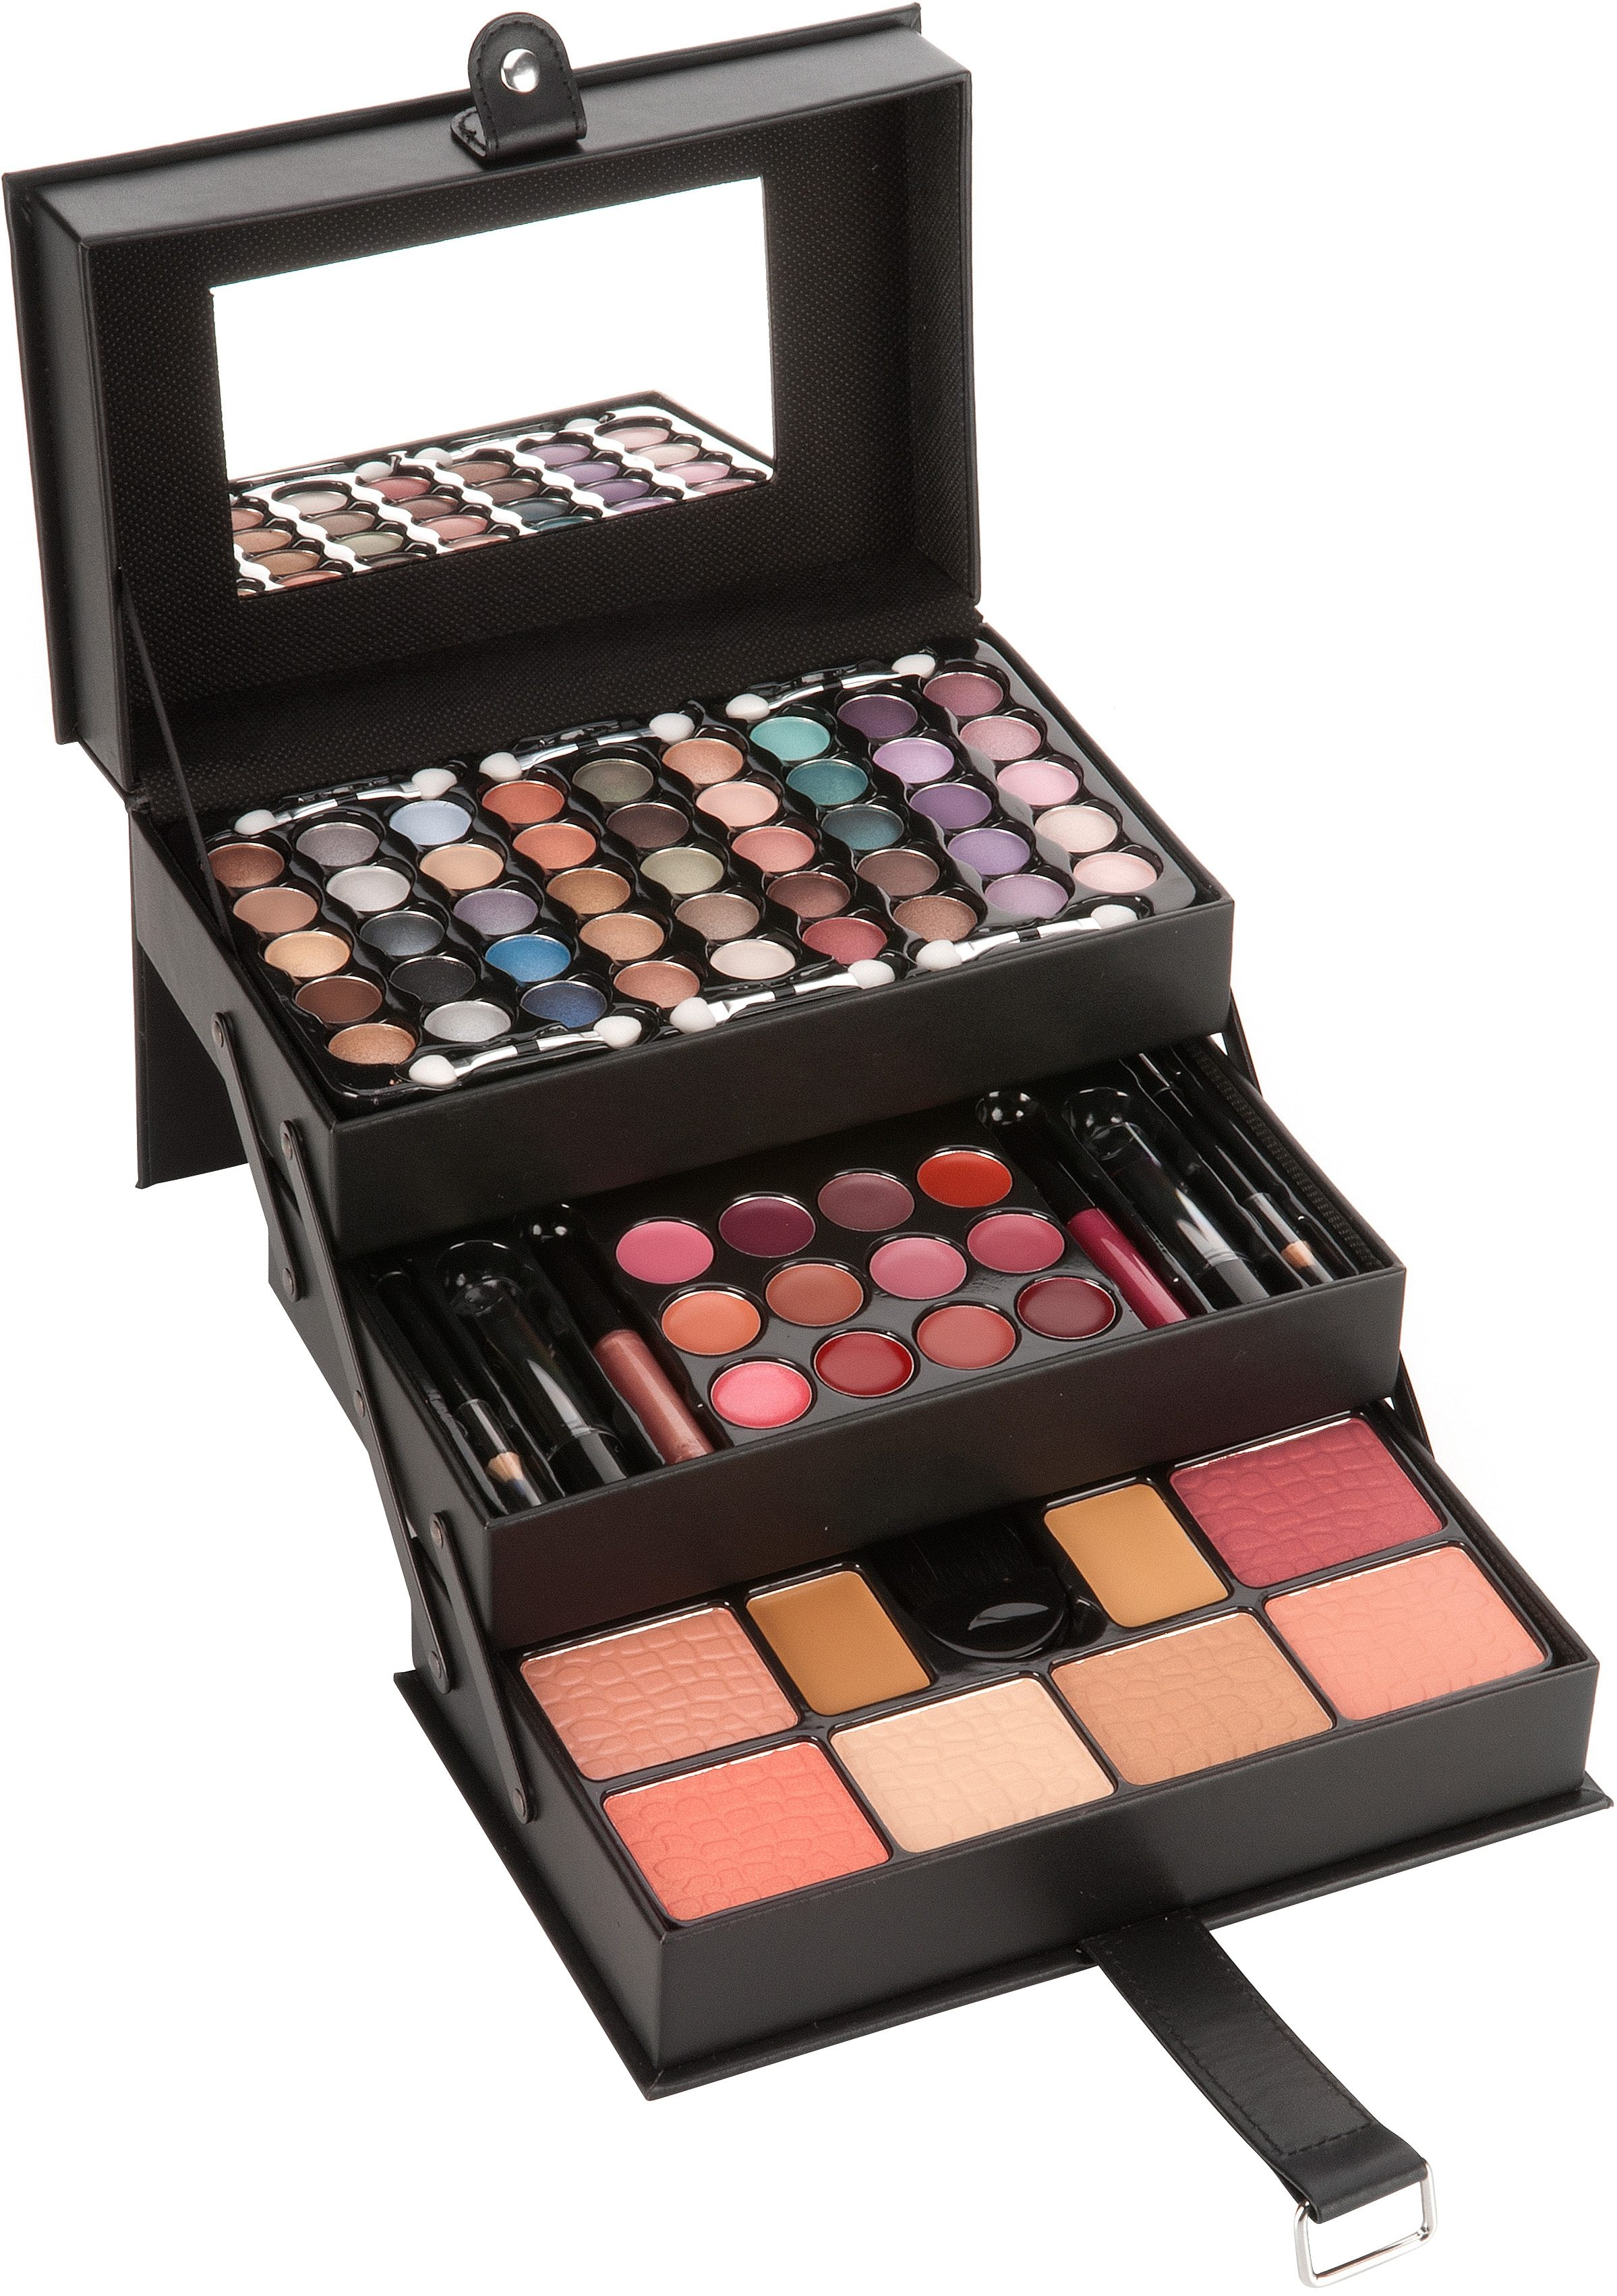 Kosmetik-Koffer ´´Jewellery Case´´ 81-tlg | Taschen > Koffer & Trolleys > Sonstige Koffer | Schwarz